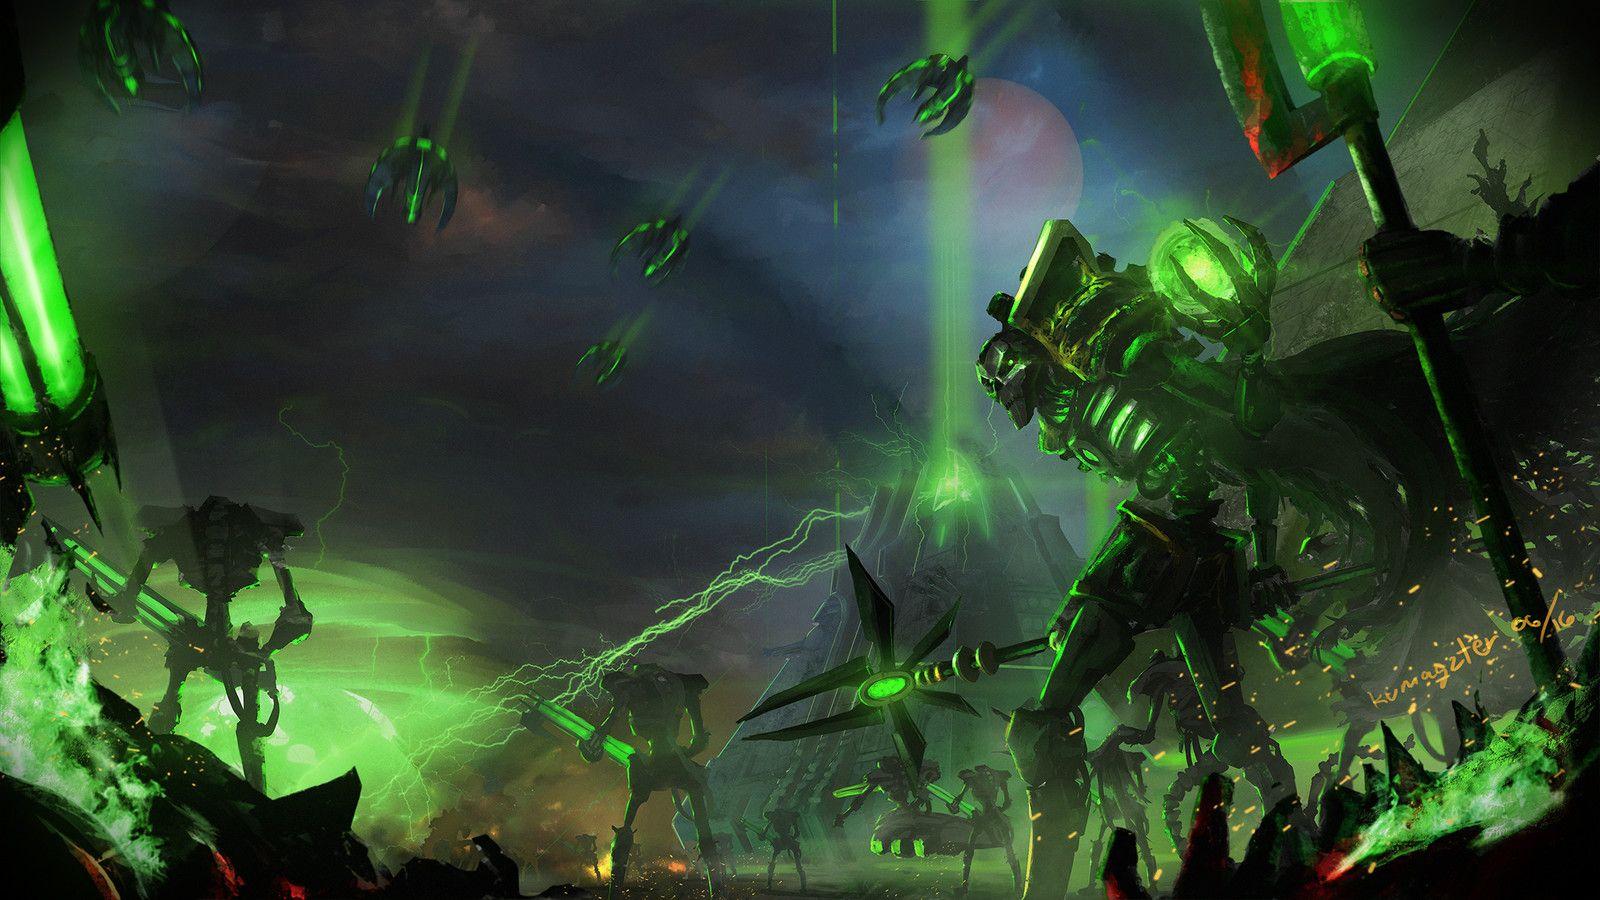 Necron Lord Kumagzter Mark Cosmiano Warhammer 40k Necrons Necron Warhammer Art